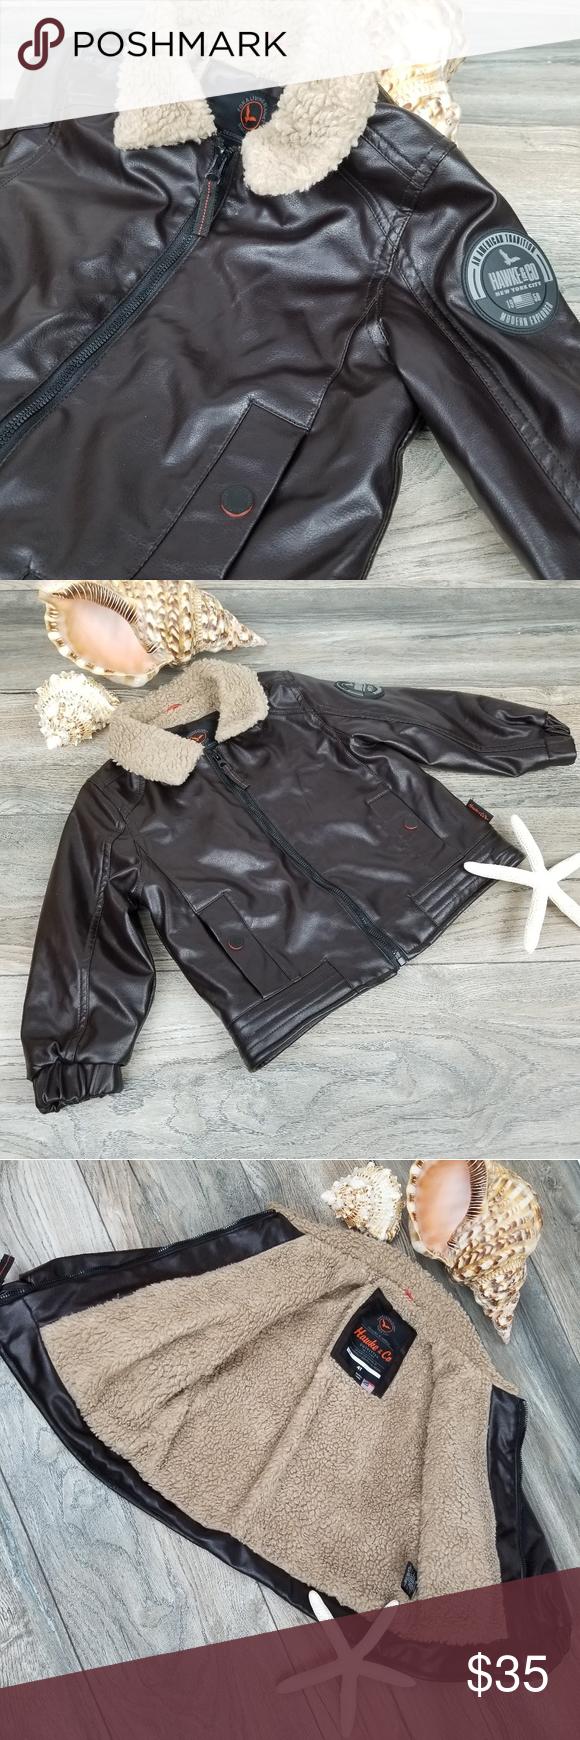 Hawke Co Bomber Aviator Flight Jacket Sz 4t Faux Leather Jacket Faux Sherpa Lining And Collar Snap Pocket Flight Jacket Clothes Design Faux Leather Jackets [ 1740 x 580 Pixel ]